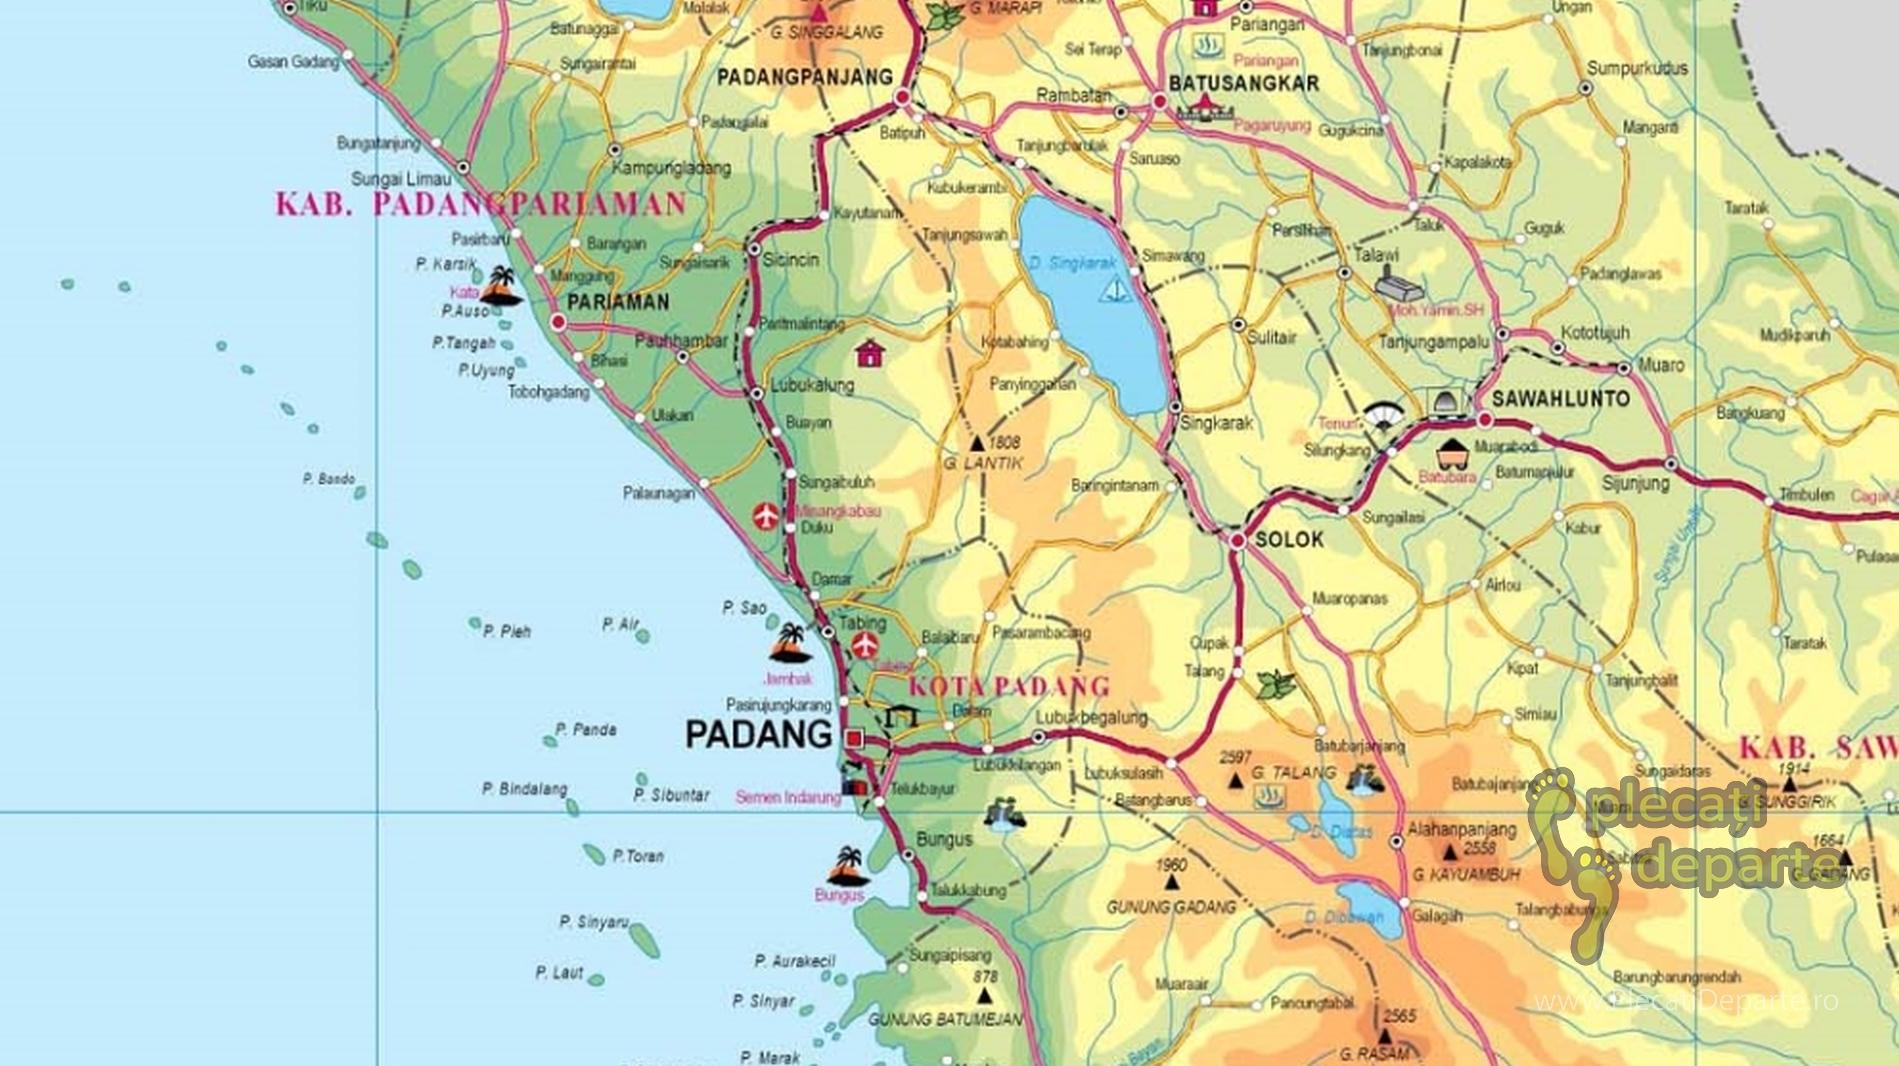 Detailed Indonesia Maps Hărți Detaliate Indonezia